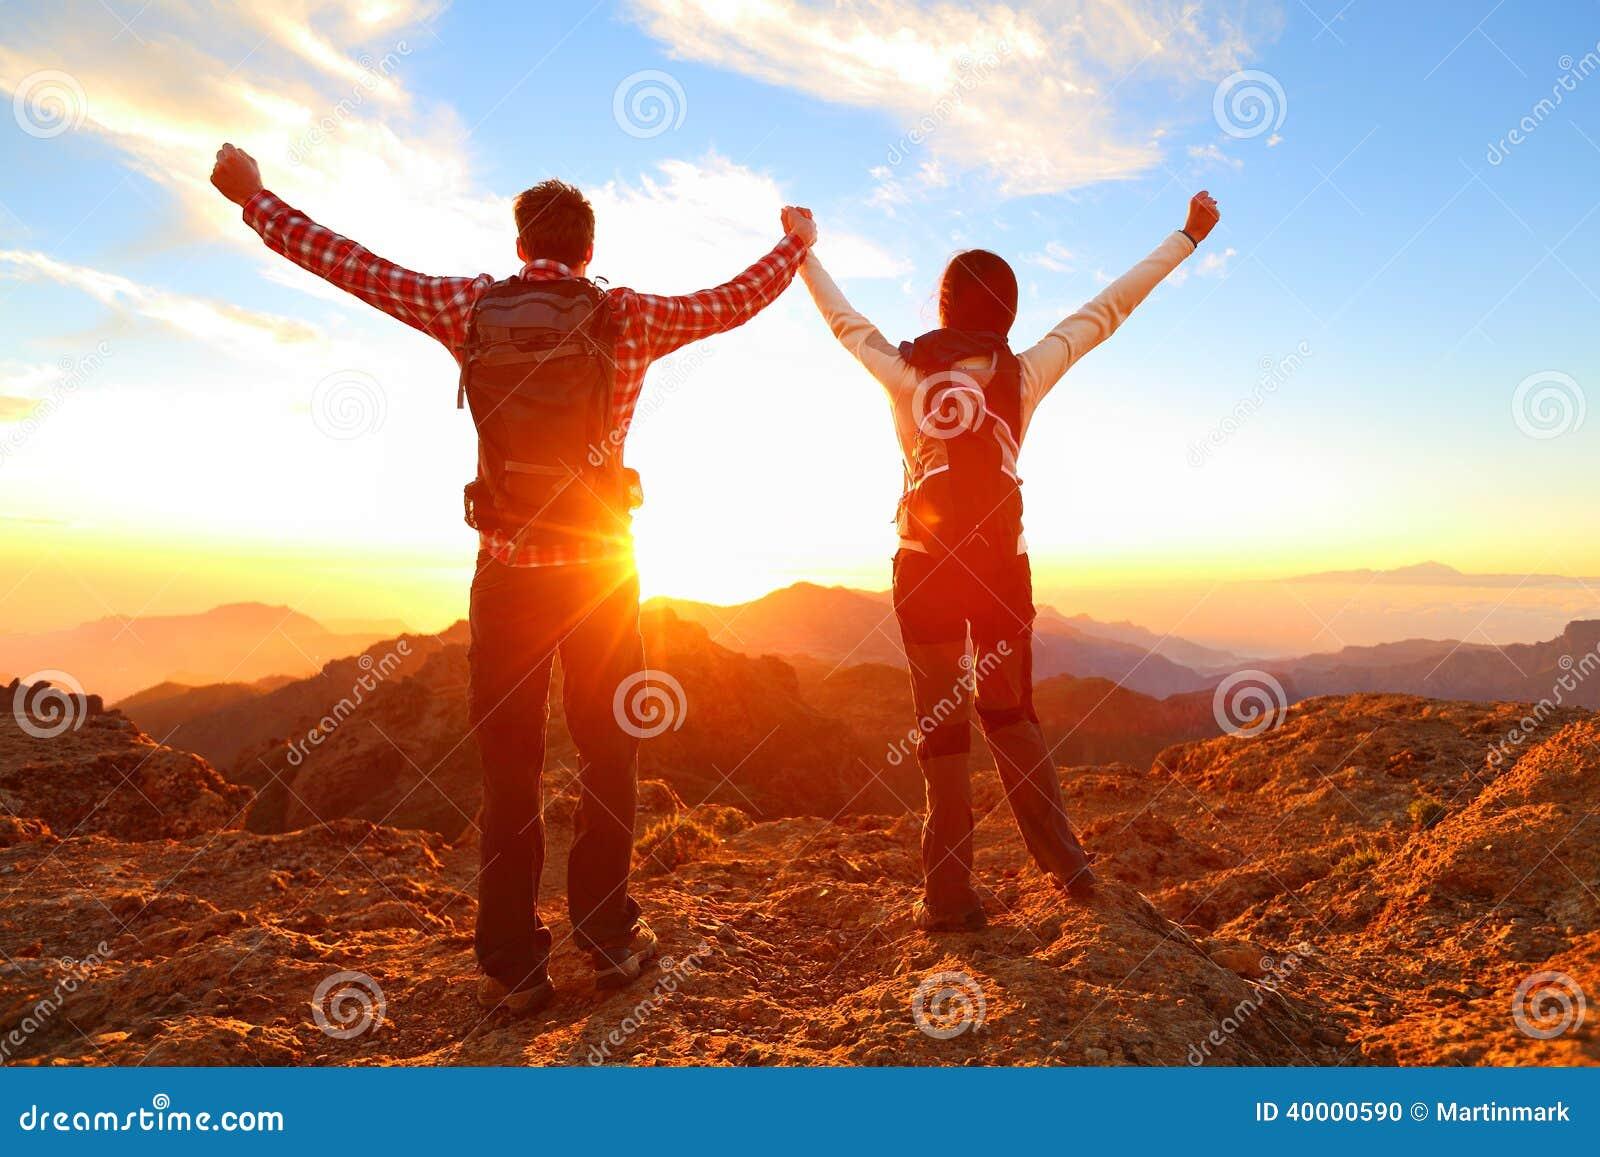 Freedom - Happy couple cheering and celebrating